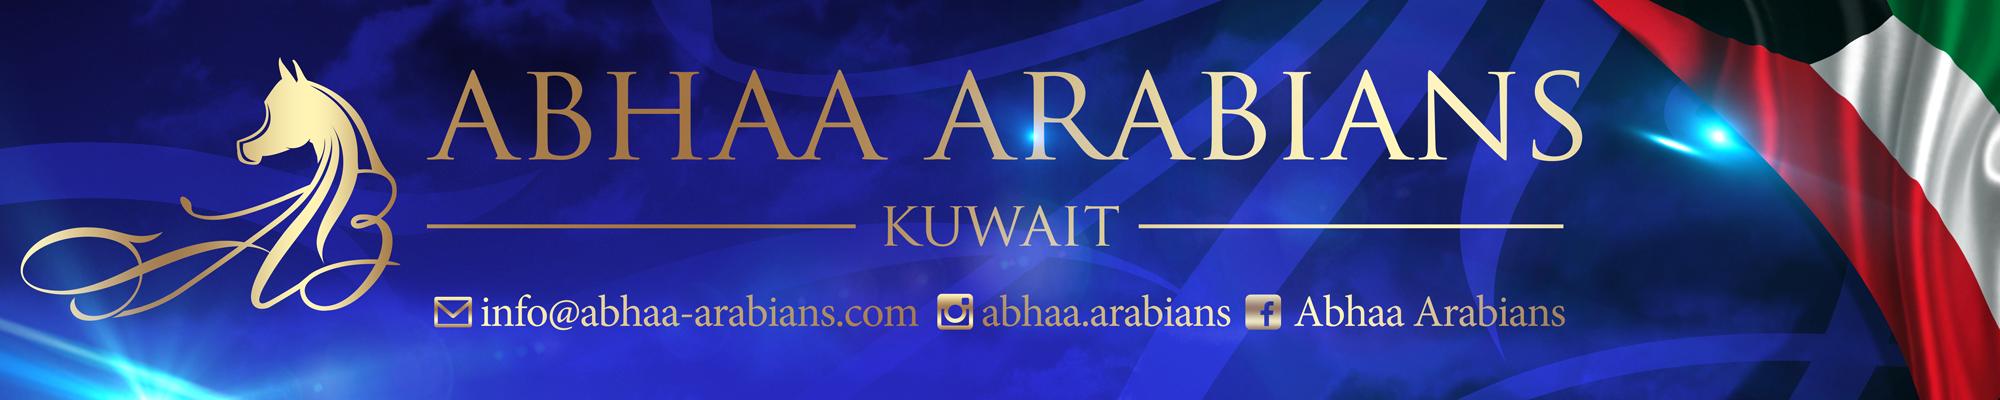 Banner-Abhaa-arabians